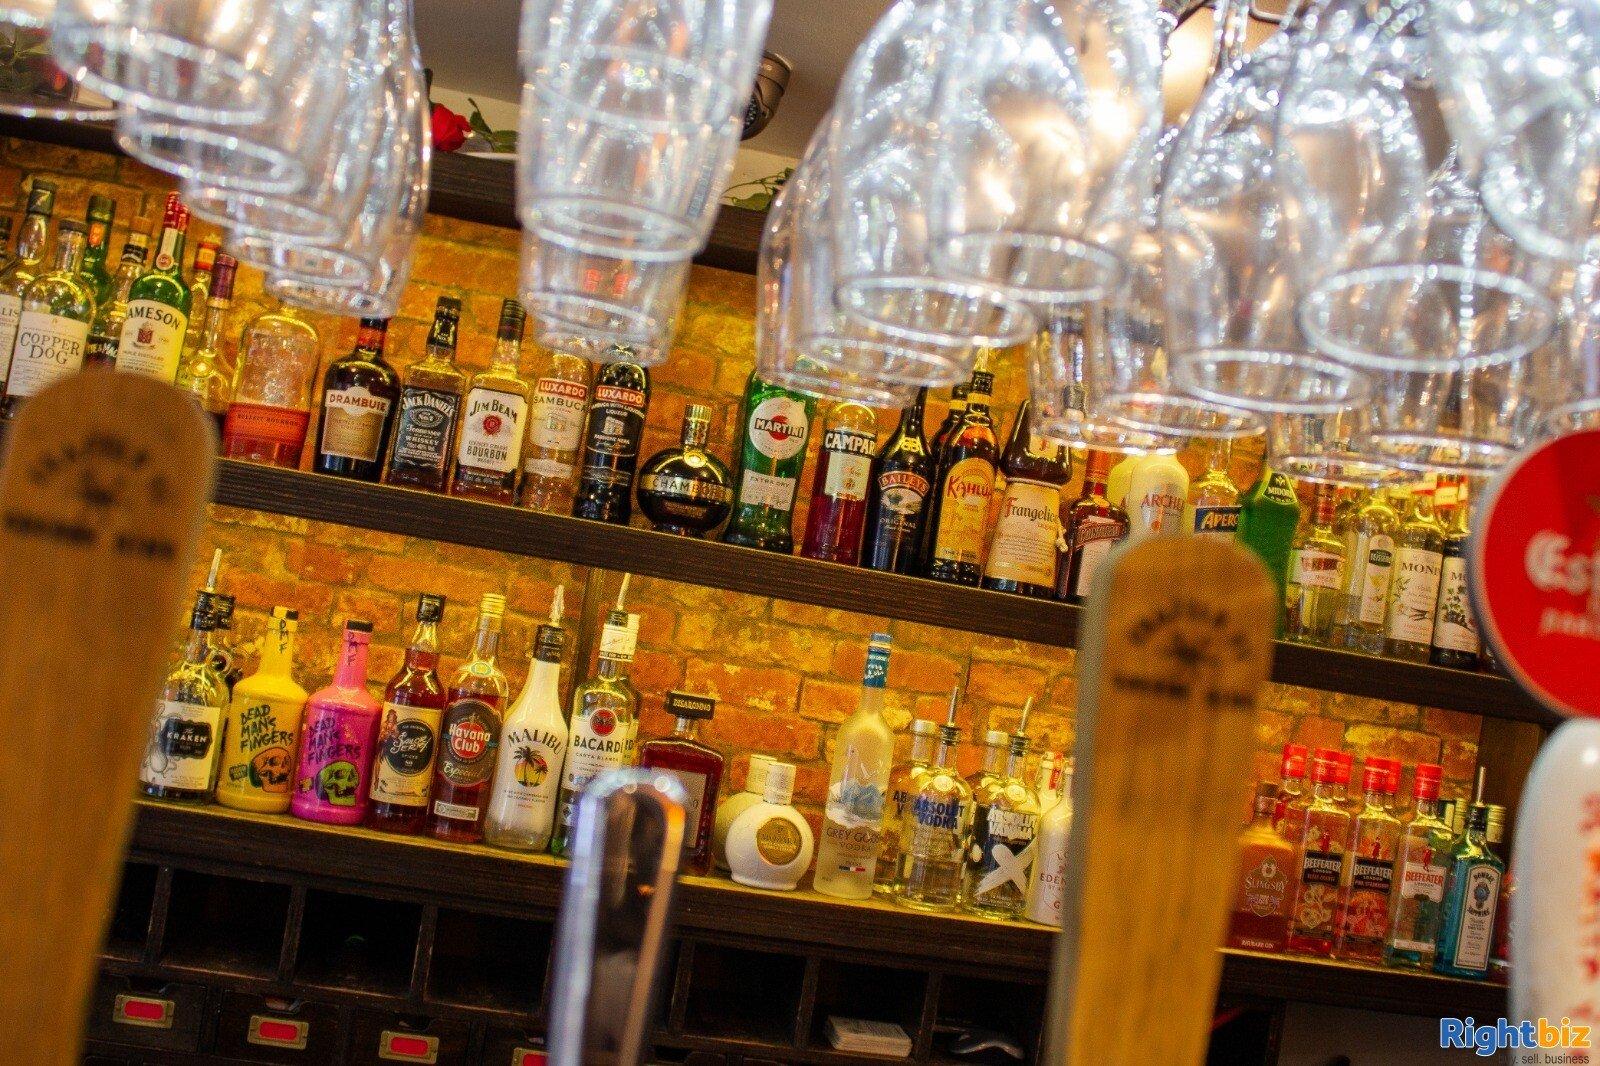 City Centre Cocktail / Wine bar / restaurant, T'a VJ's Finkle Street, York. - Image 6